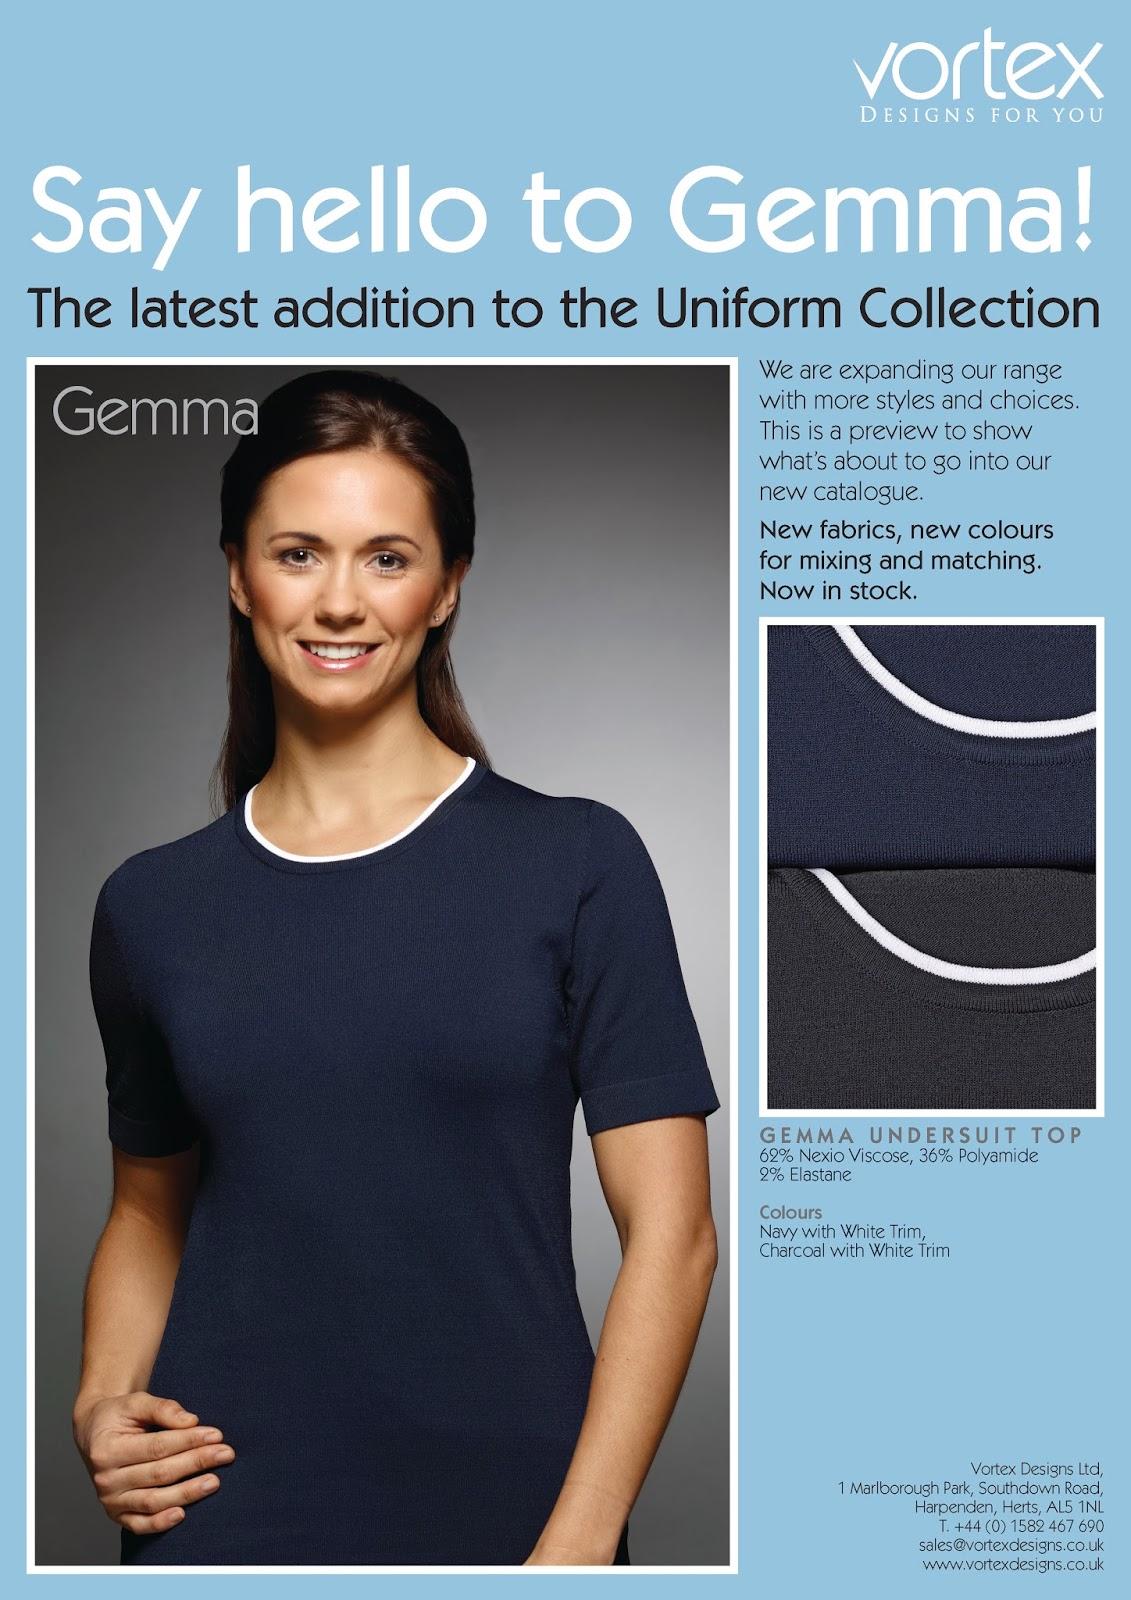 http://www.blousesandknitwearforwork.co.uk/product/141/0/gemma-navy